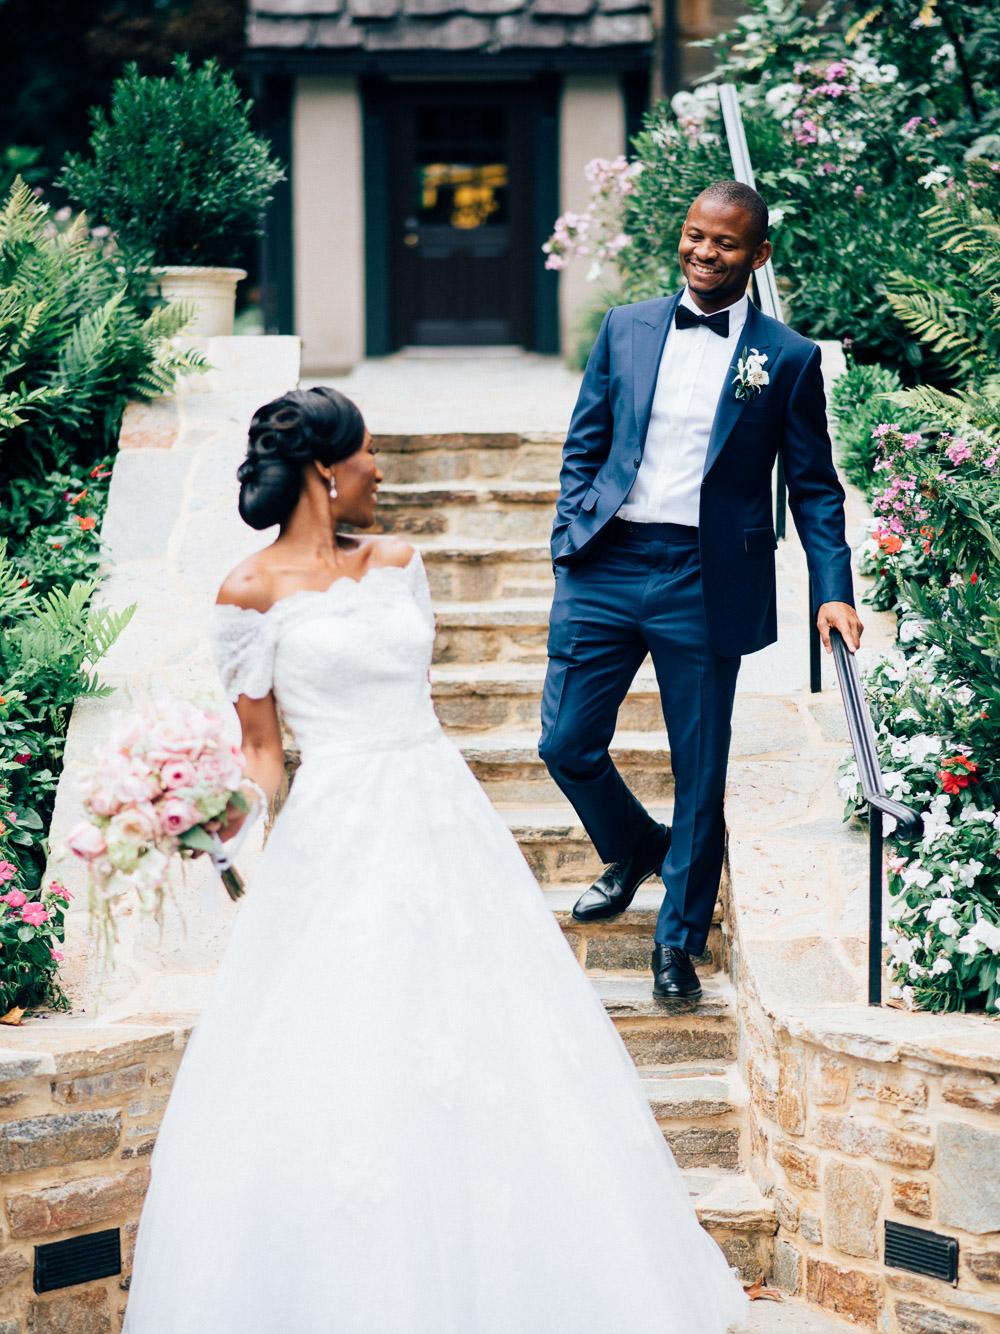 destination-wedding-photography Cloisters Castle Wedding | Towson Maryland